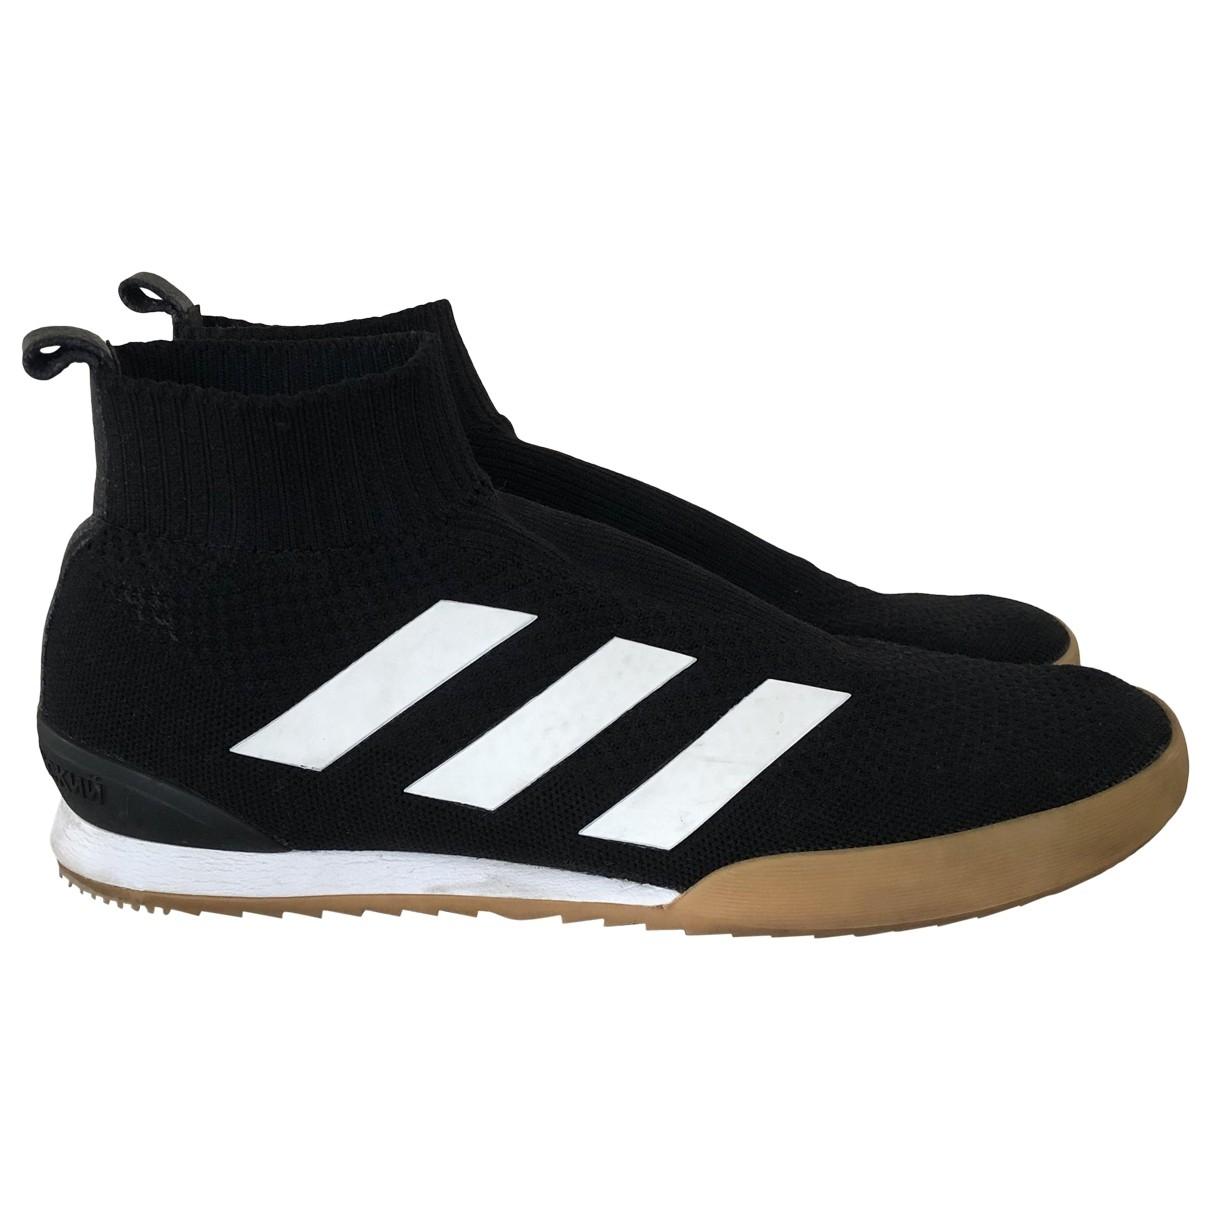 Adidas X Gosha Rubchinskiy N Black Cloth Trainers for Men 10 UK